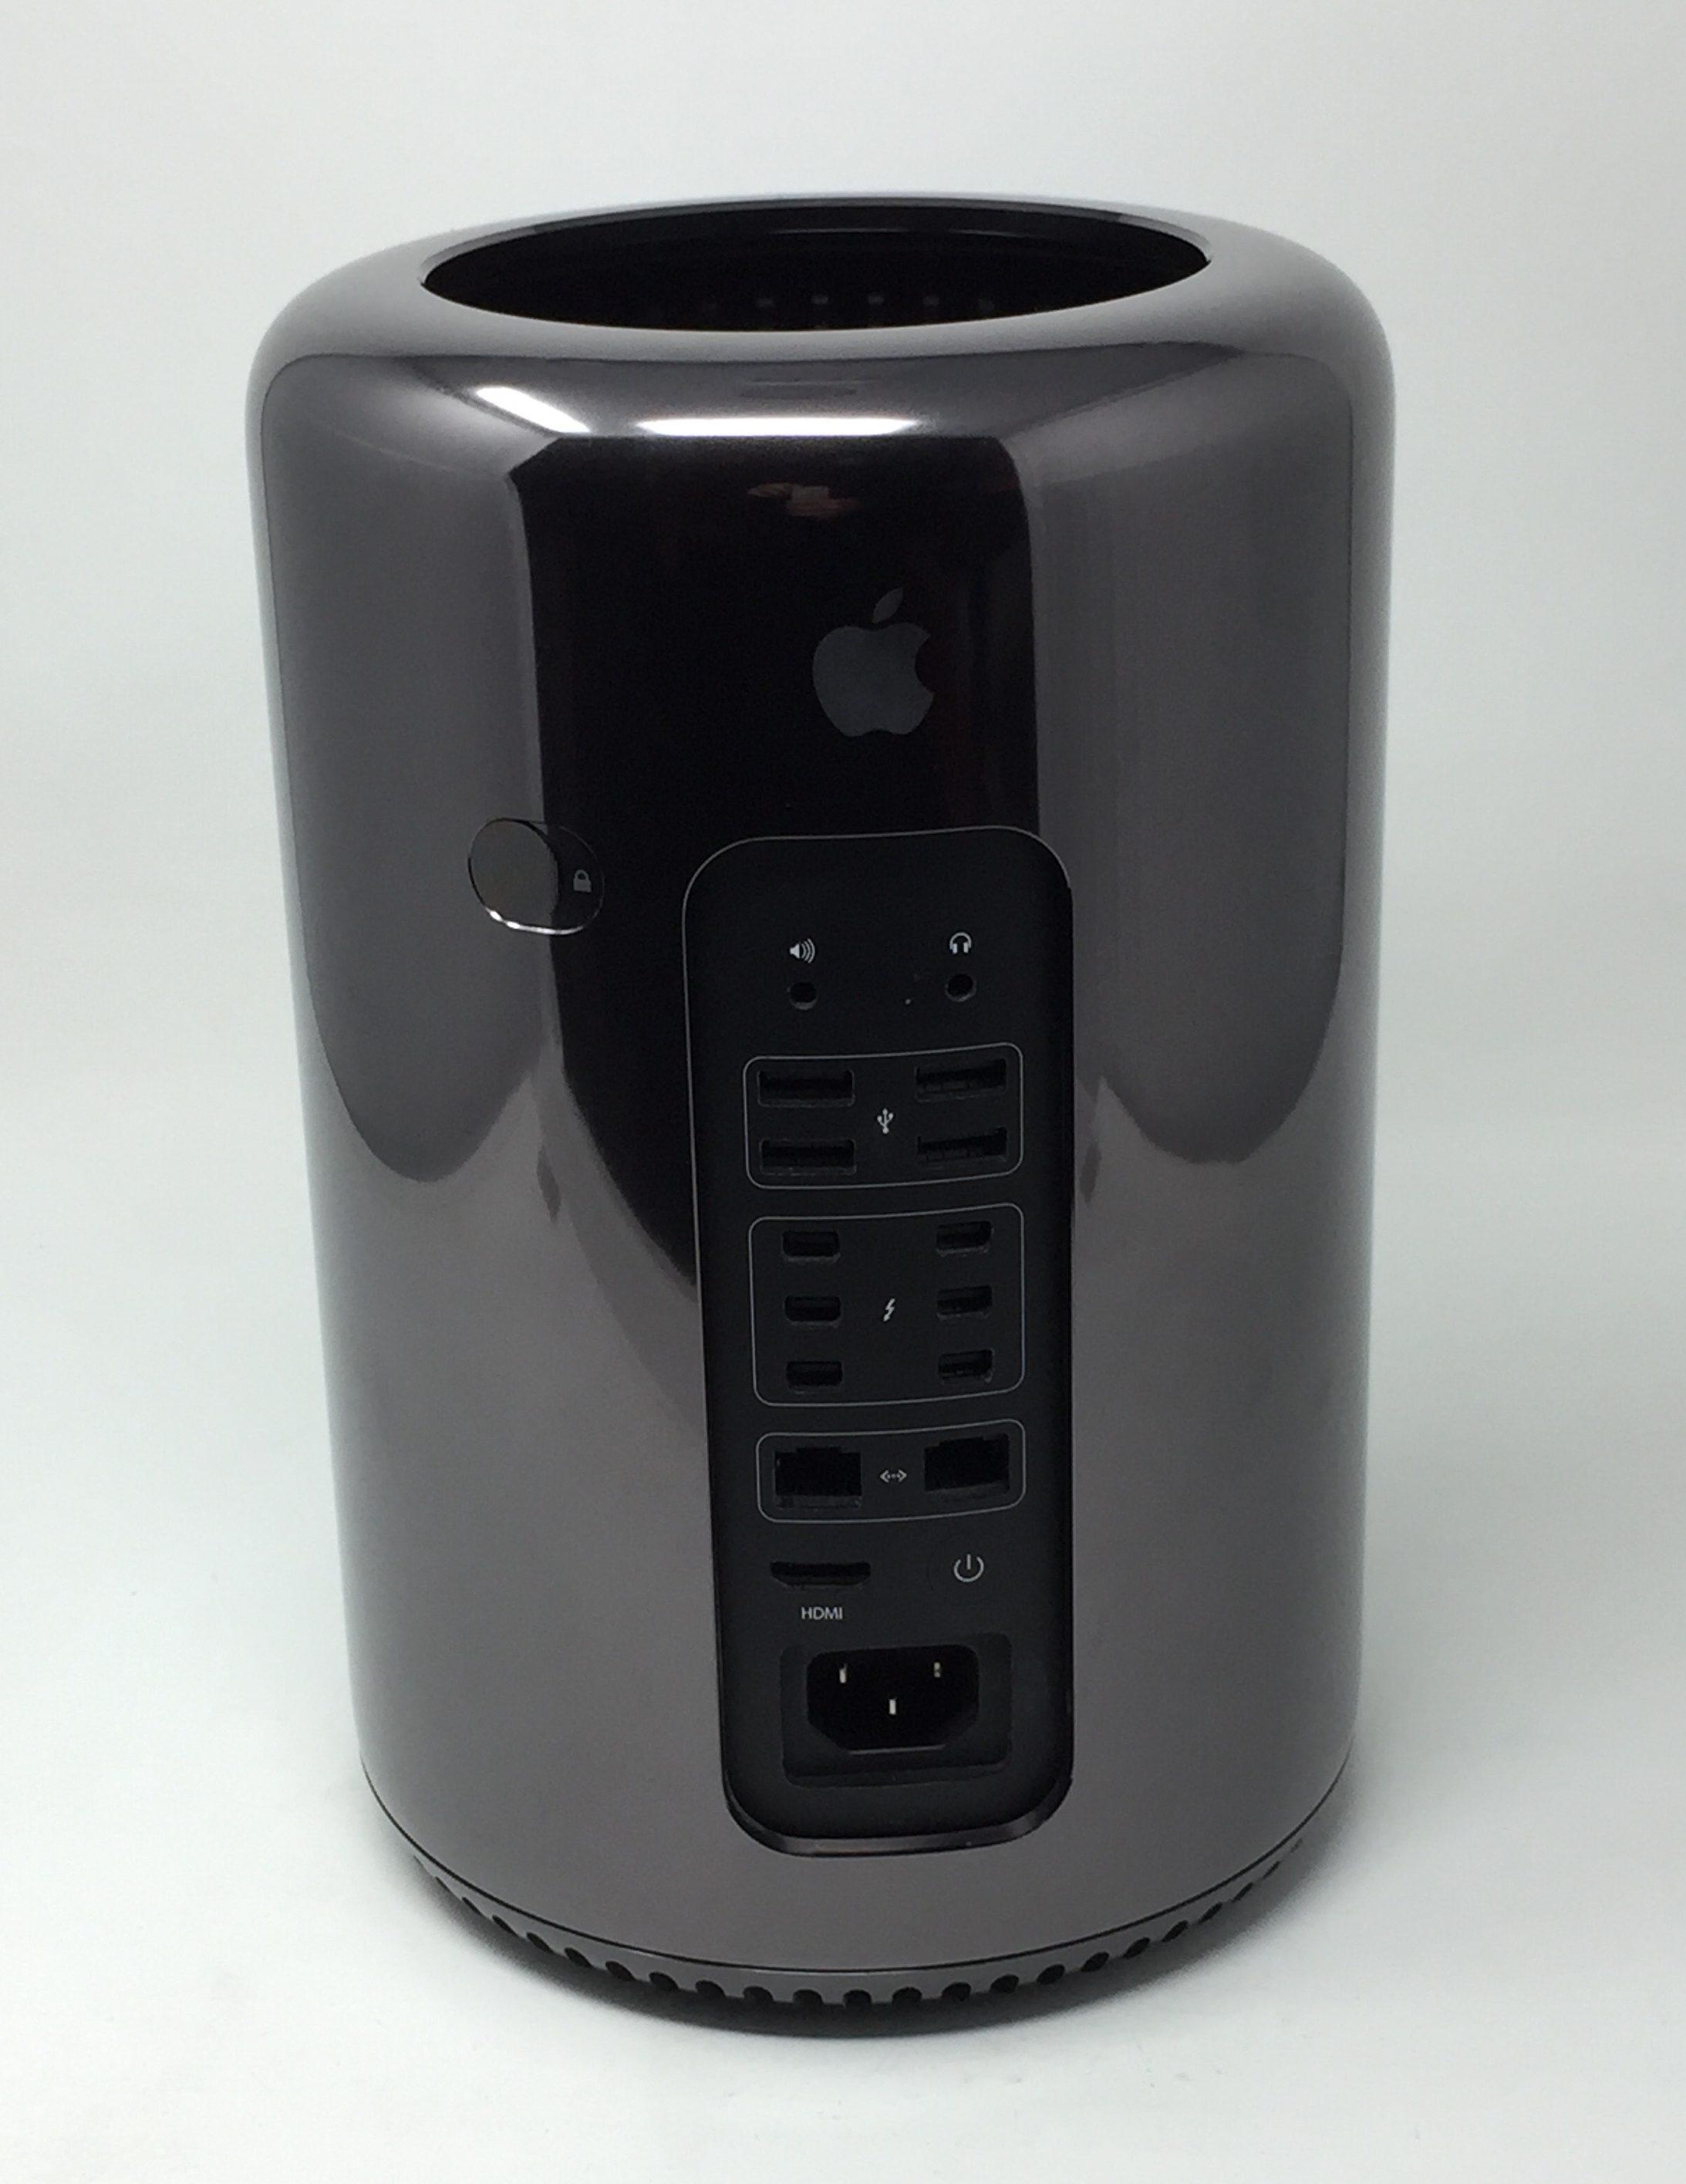 Mac Pro Late 2013 (Intel 8-Core Xeon 3.0 GHz 12 GB RAM 512 GB SSD), INTEL XEON E5 3 GHz, 16 GB 1866MHz DDR3, SSD: 512 GB, Afbeelding 2